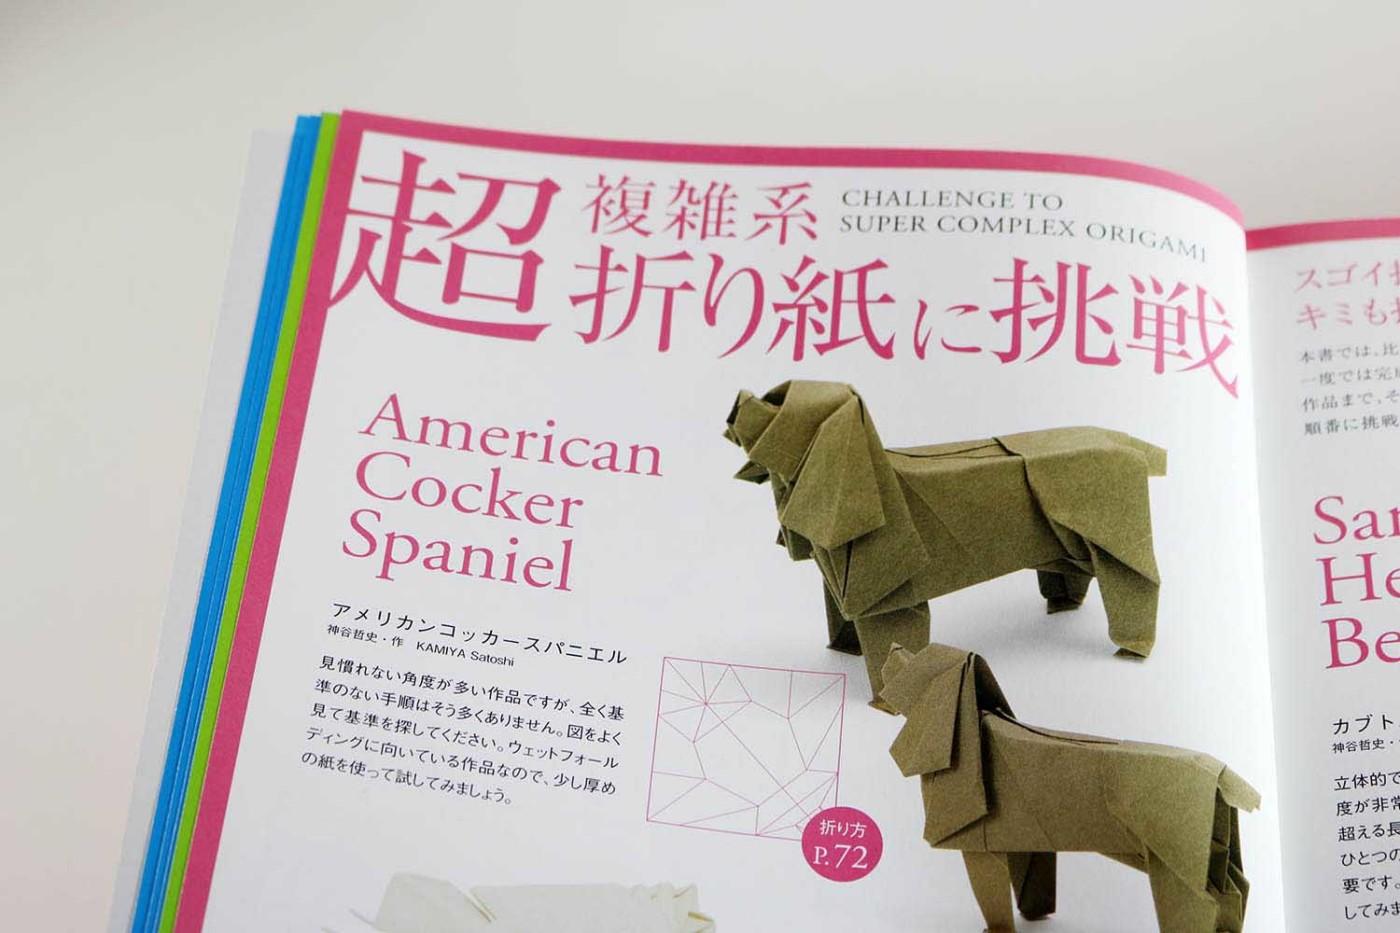 Works of Satoshi Kamiya(Book) - OrigamiArt.Us | 933x1400